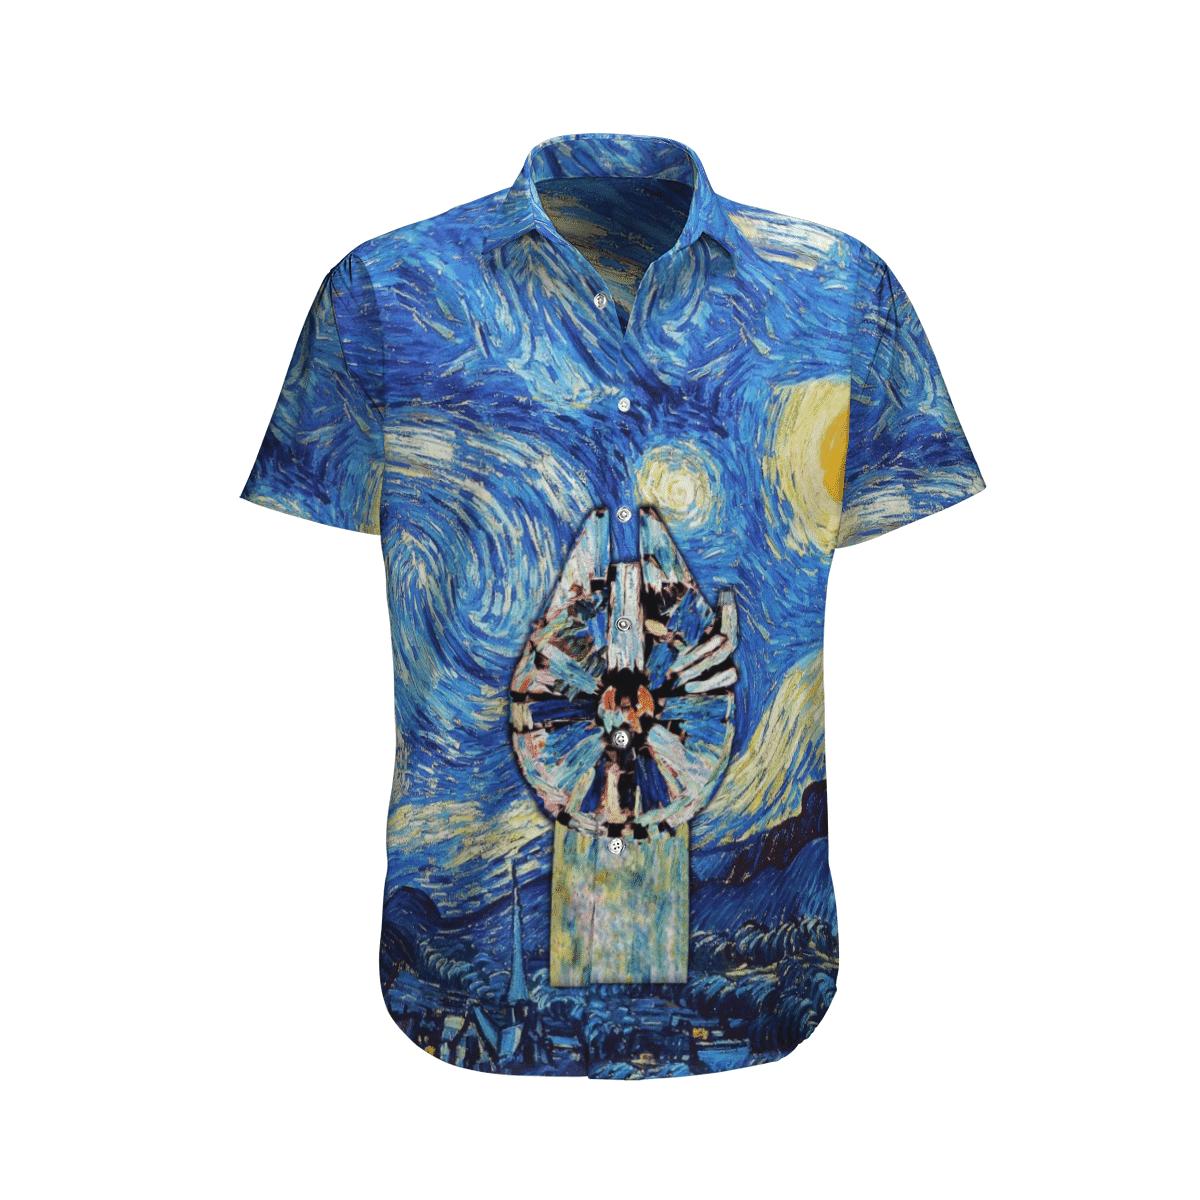 Star wars Object in fade paiting Hawaiian Shirt